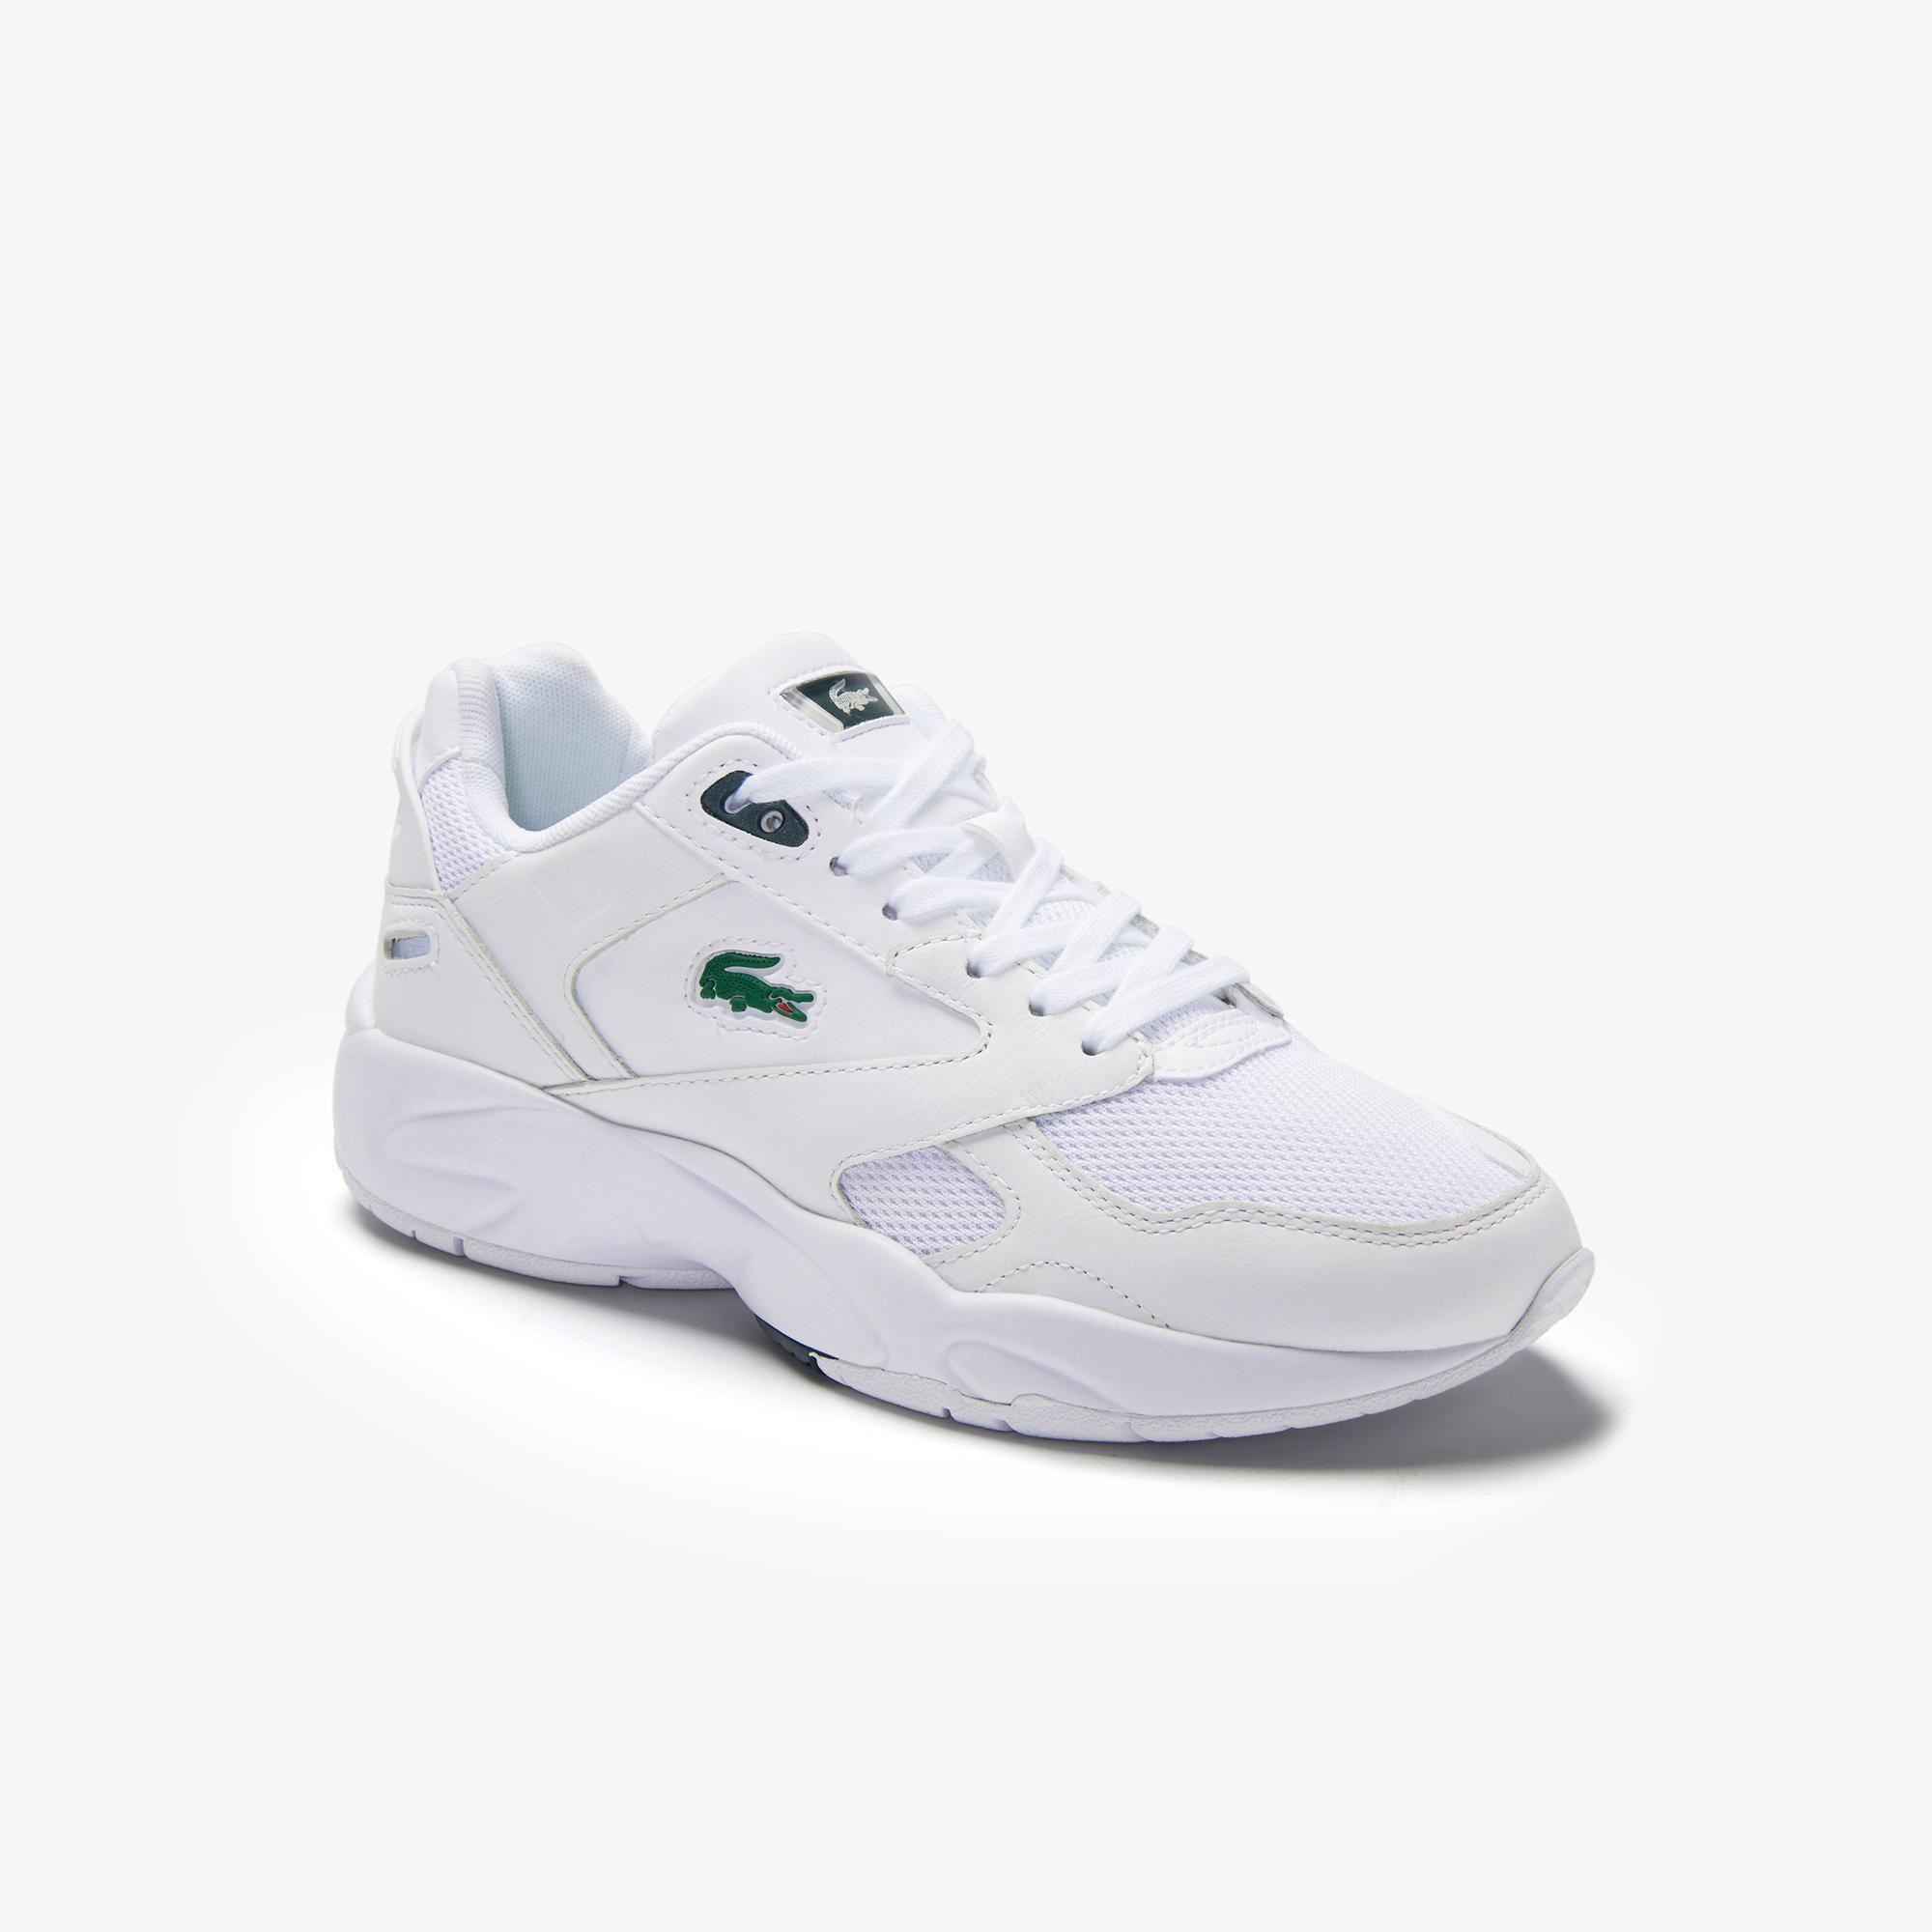 Lacoste Storm 96 Lo 0120 3 Sfa Damskie Sneakersy